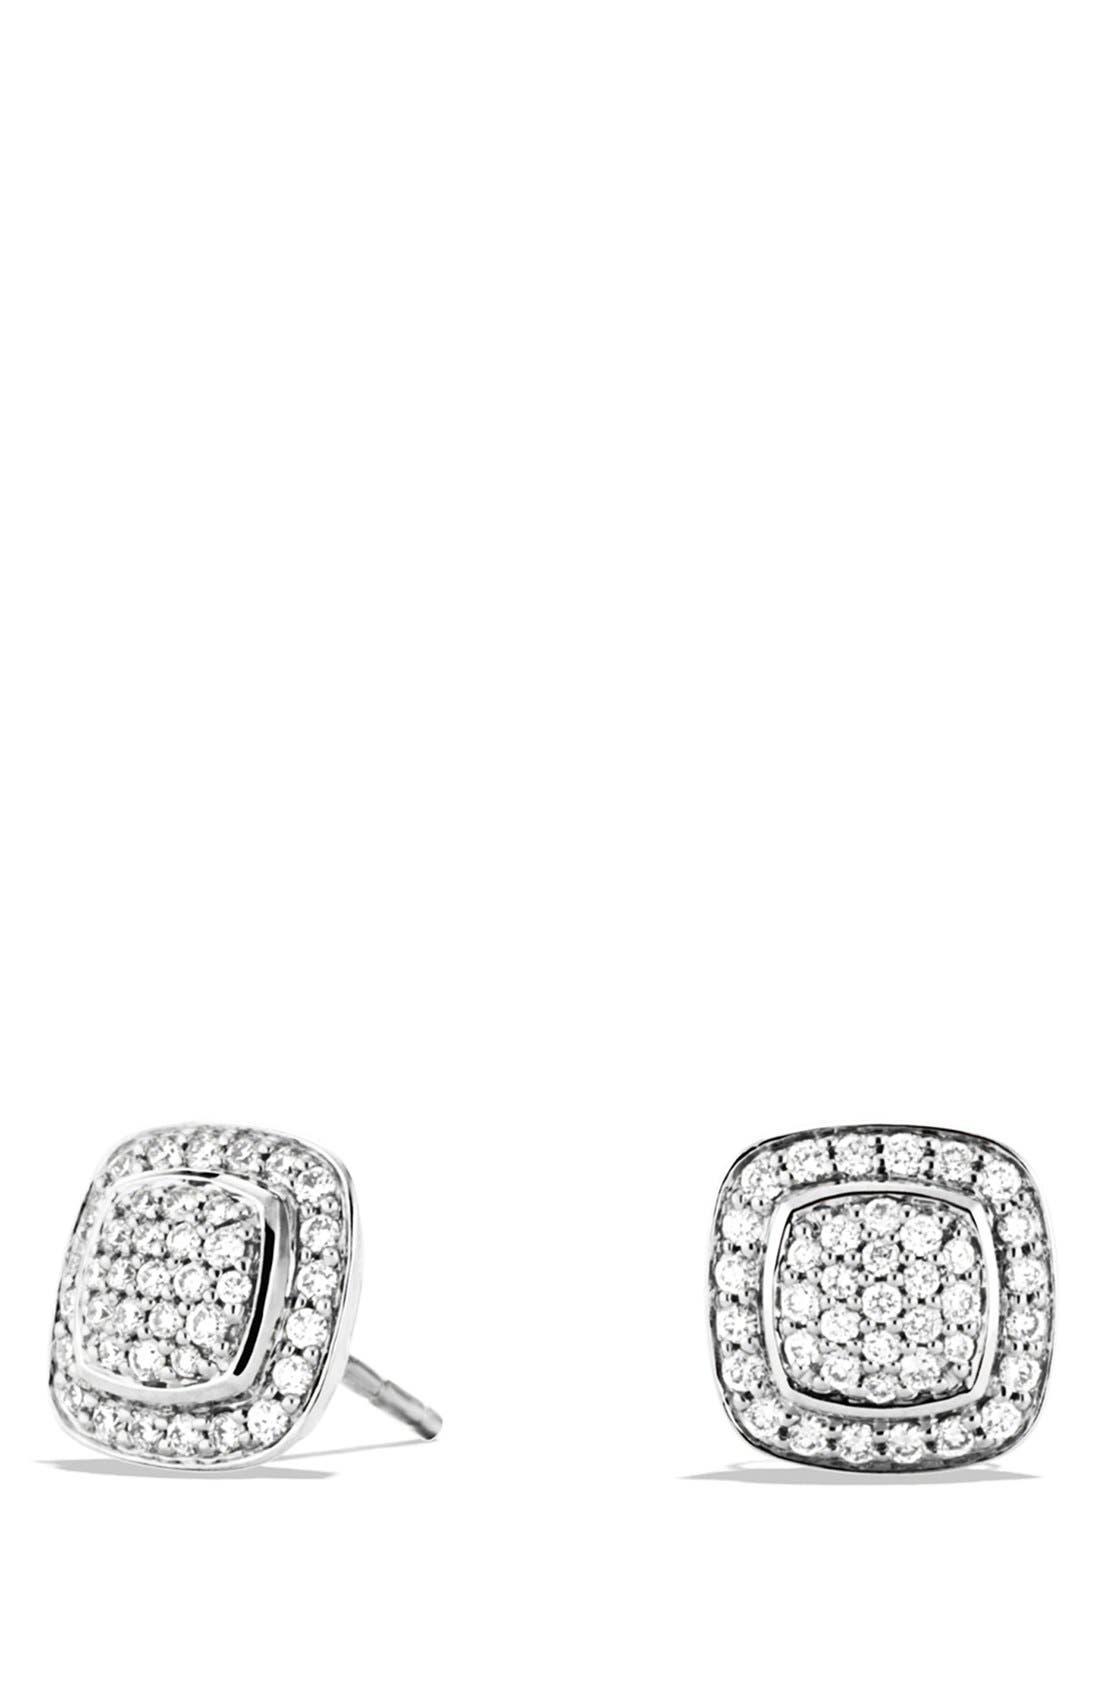 David Yurman 'Albion' Earrings with Diamonds